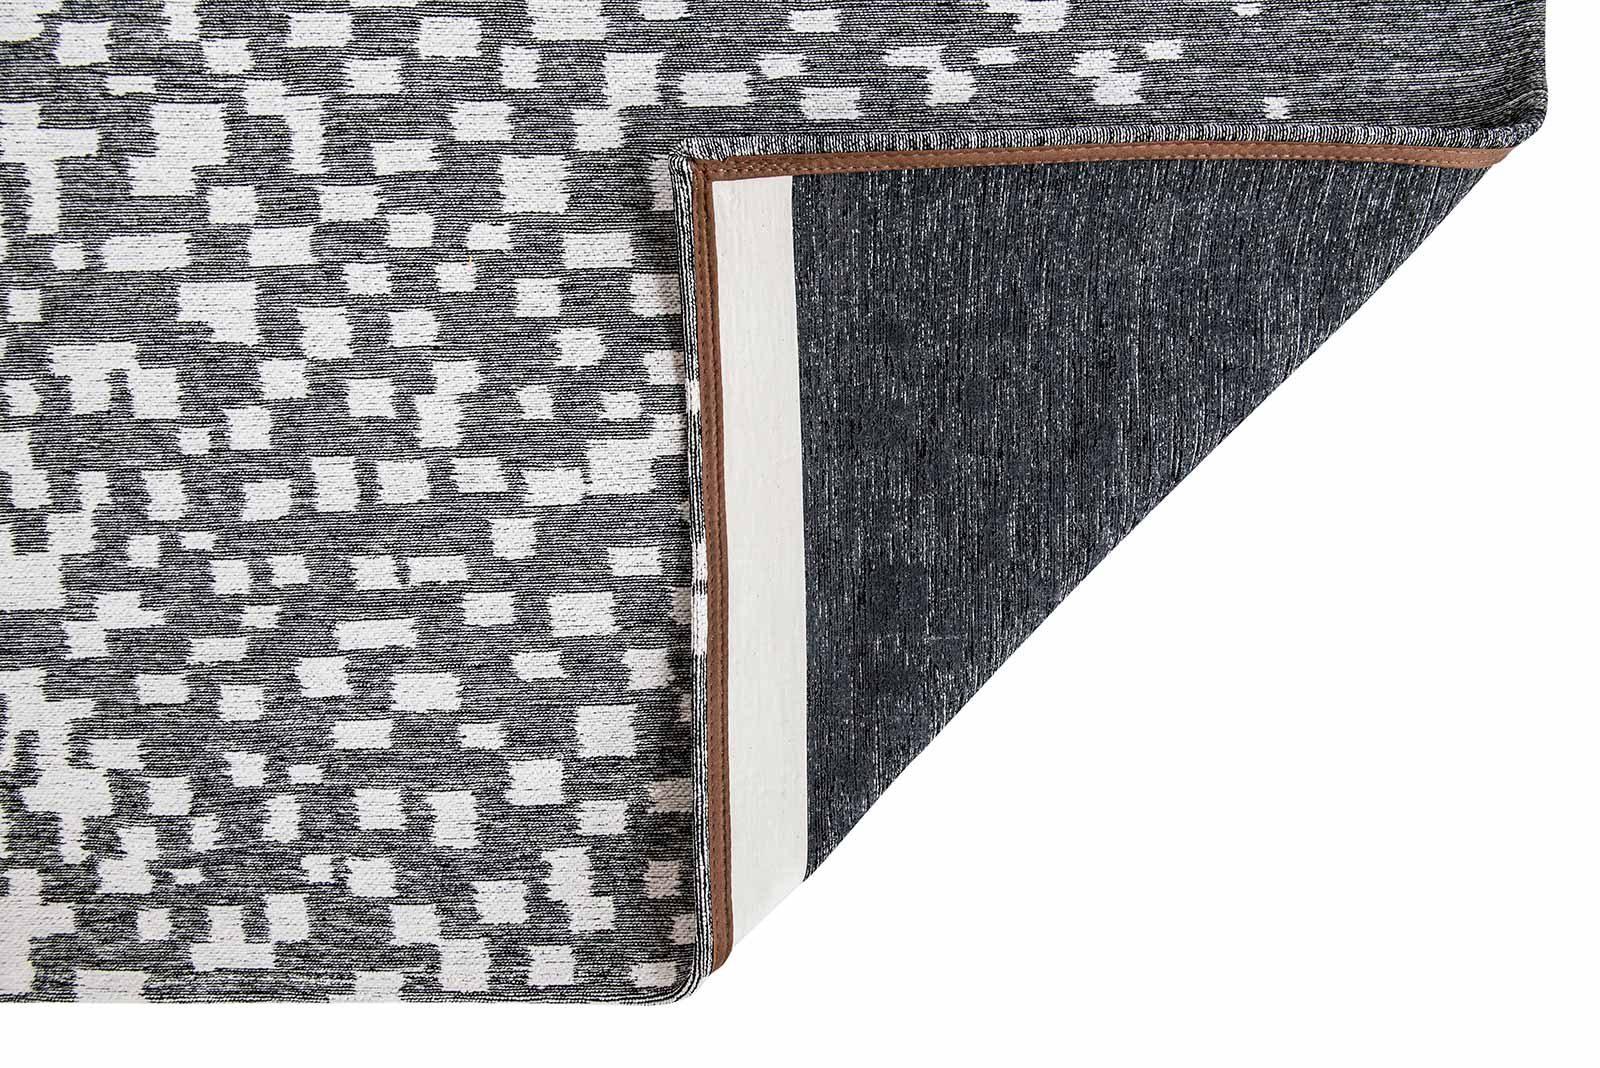 Louis De Poortere alfombras Villa Nova LX 8779 Freyr Carbon back